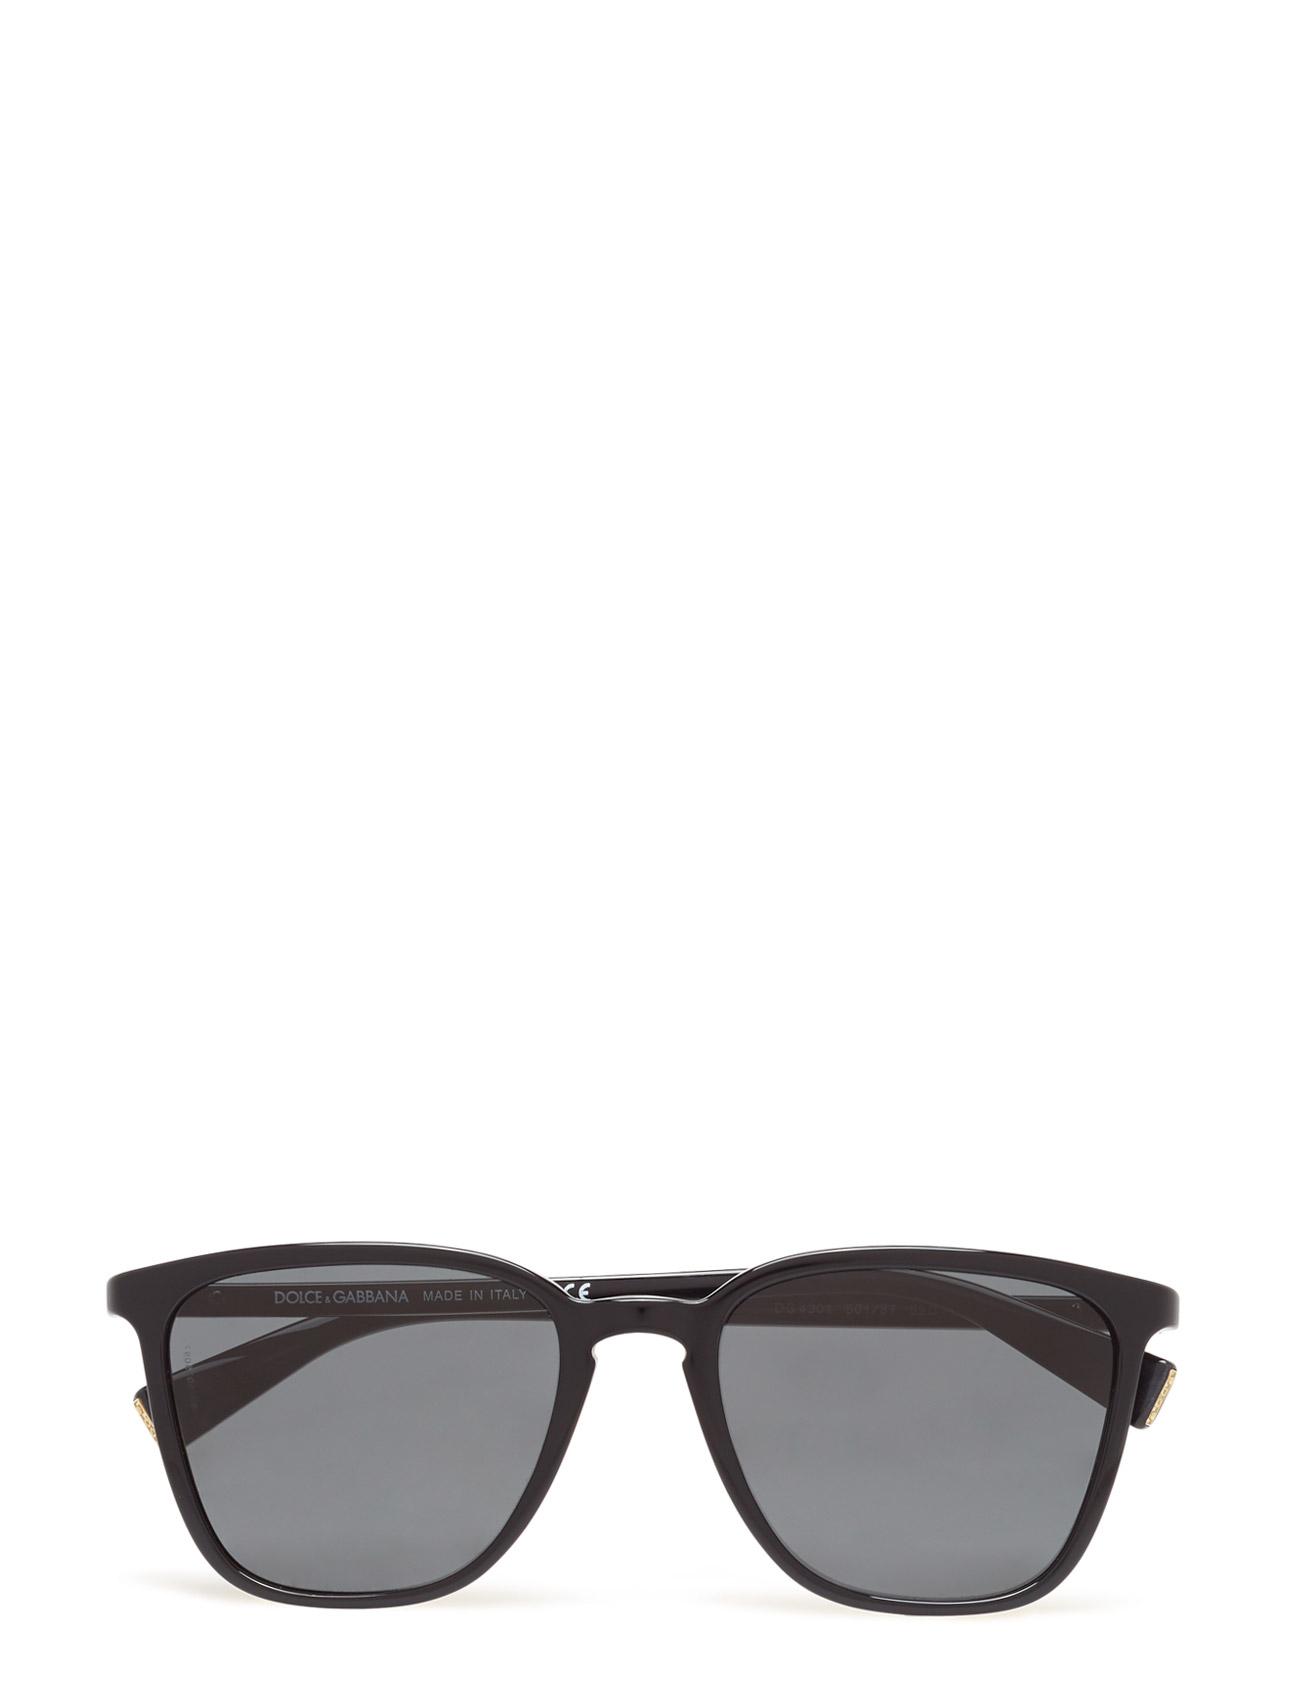 Not Defined Dolce & Gabbana Sunglasses Solbriller til Herrer i